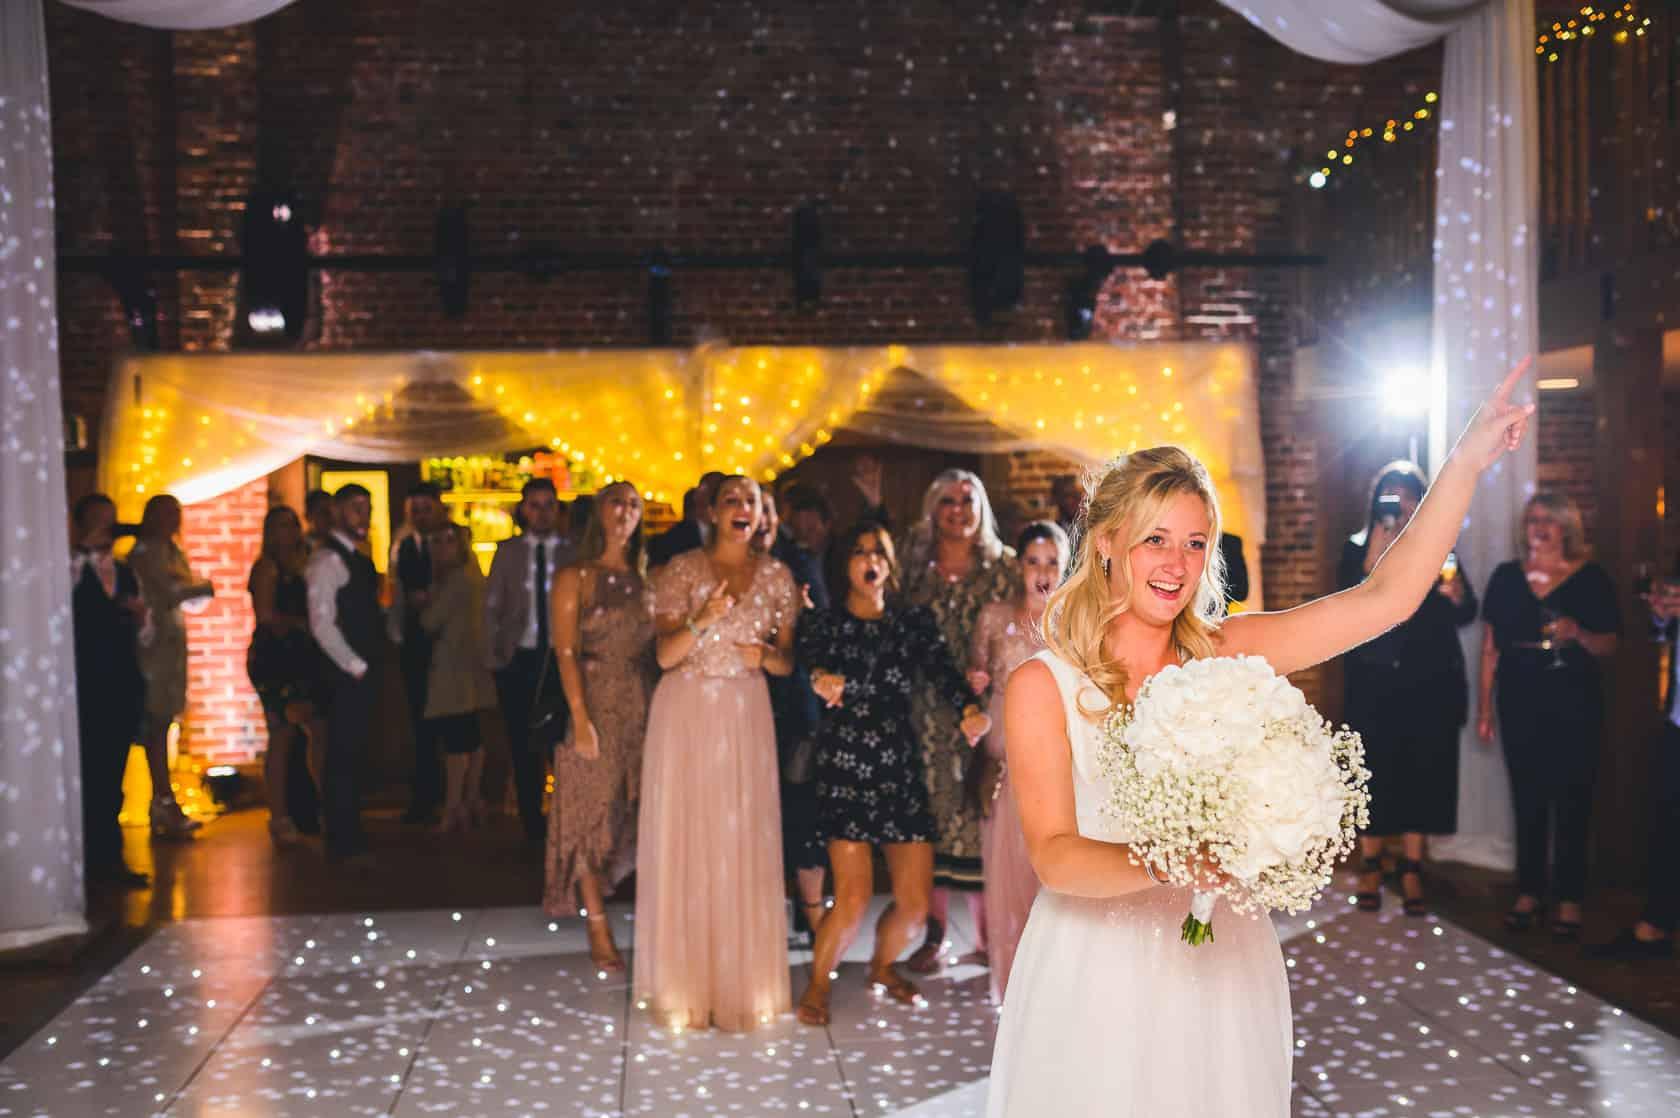 Best_Wedding_Photography_2019_Wedding-Photographer-Essex_106